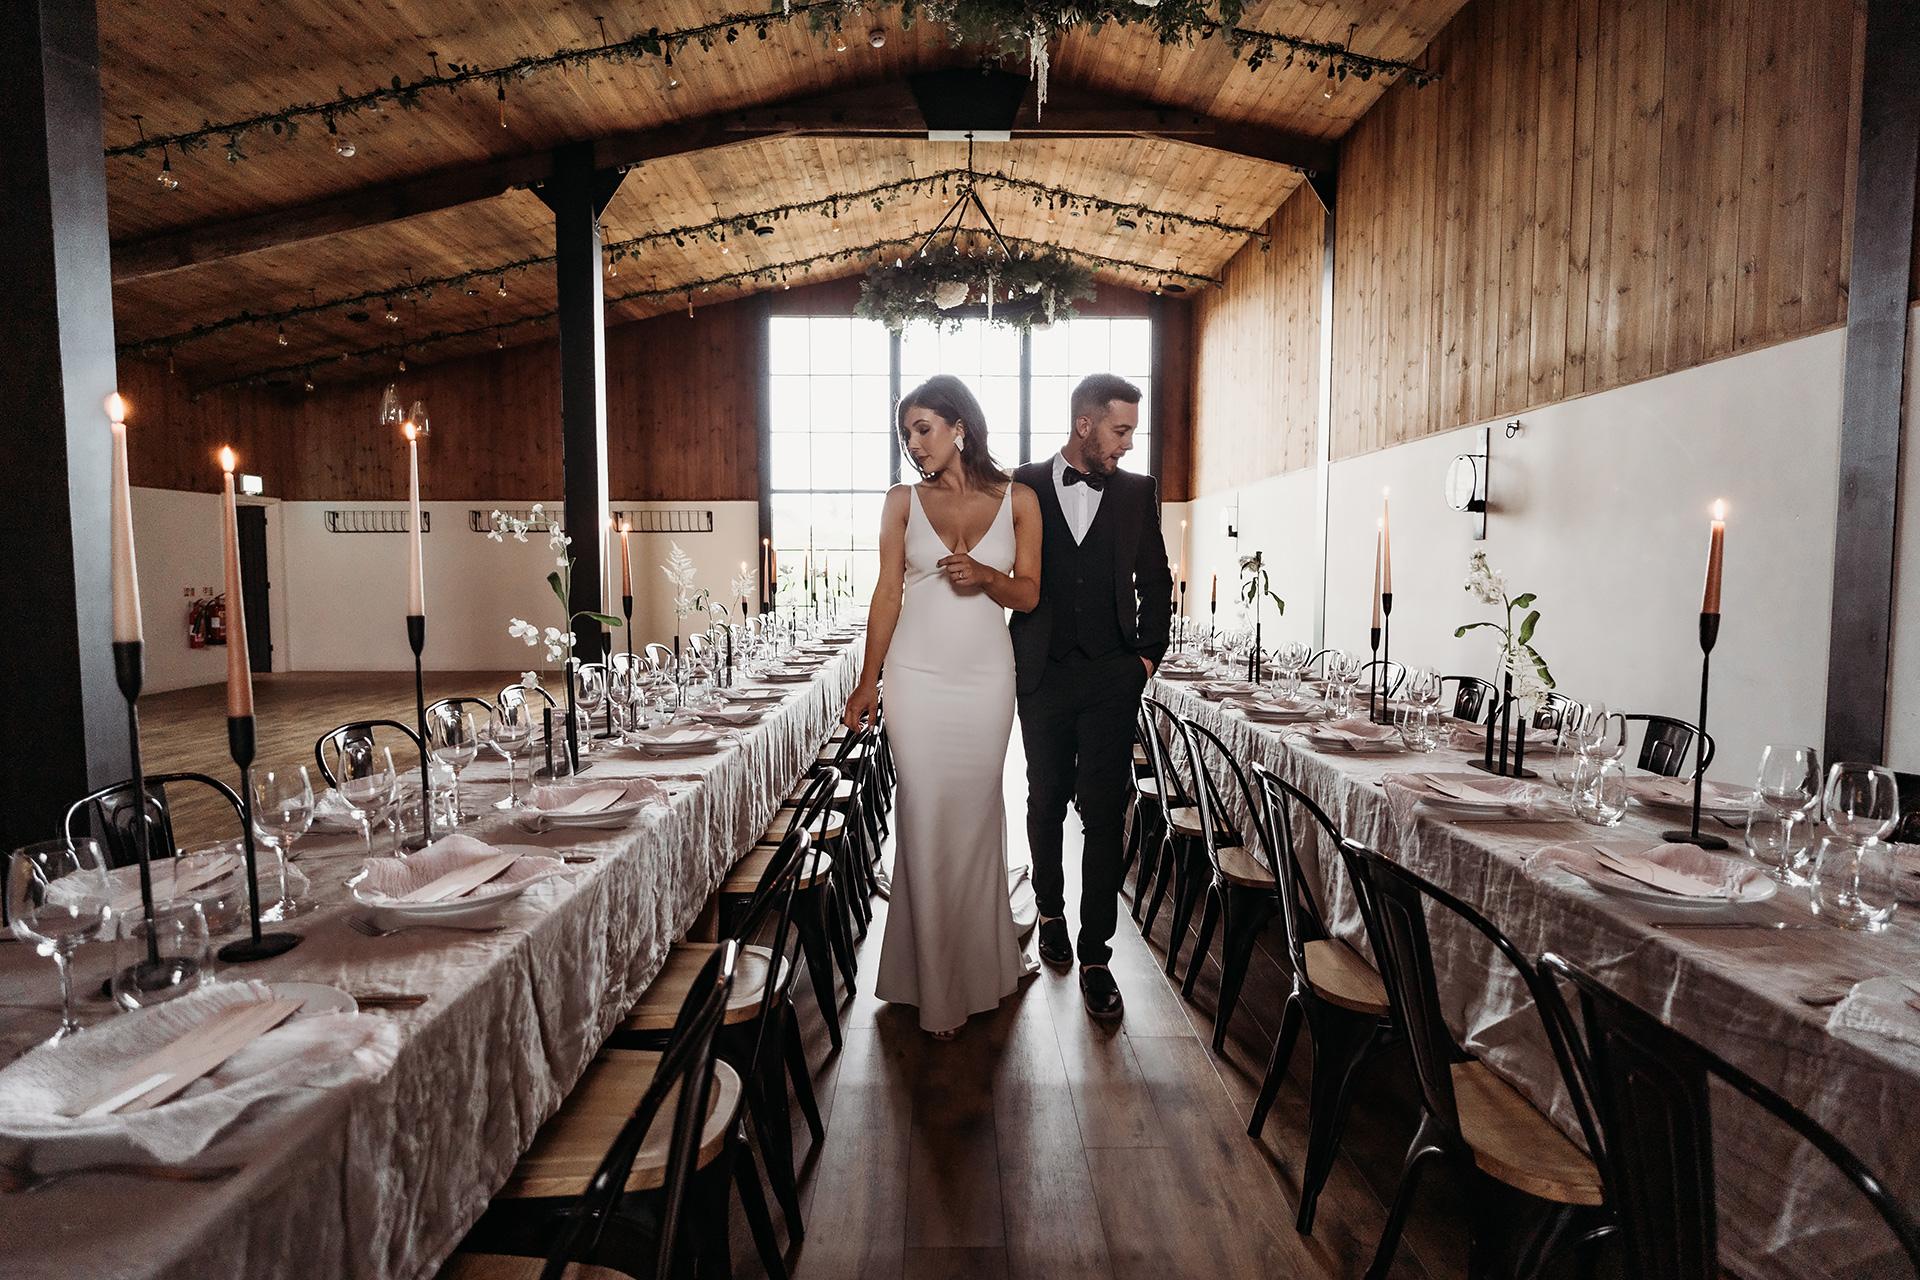 The Stable Barn   Upton Barn Wedding Venue   Image by Kamila Nowak Photography